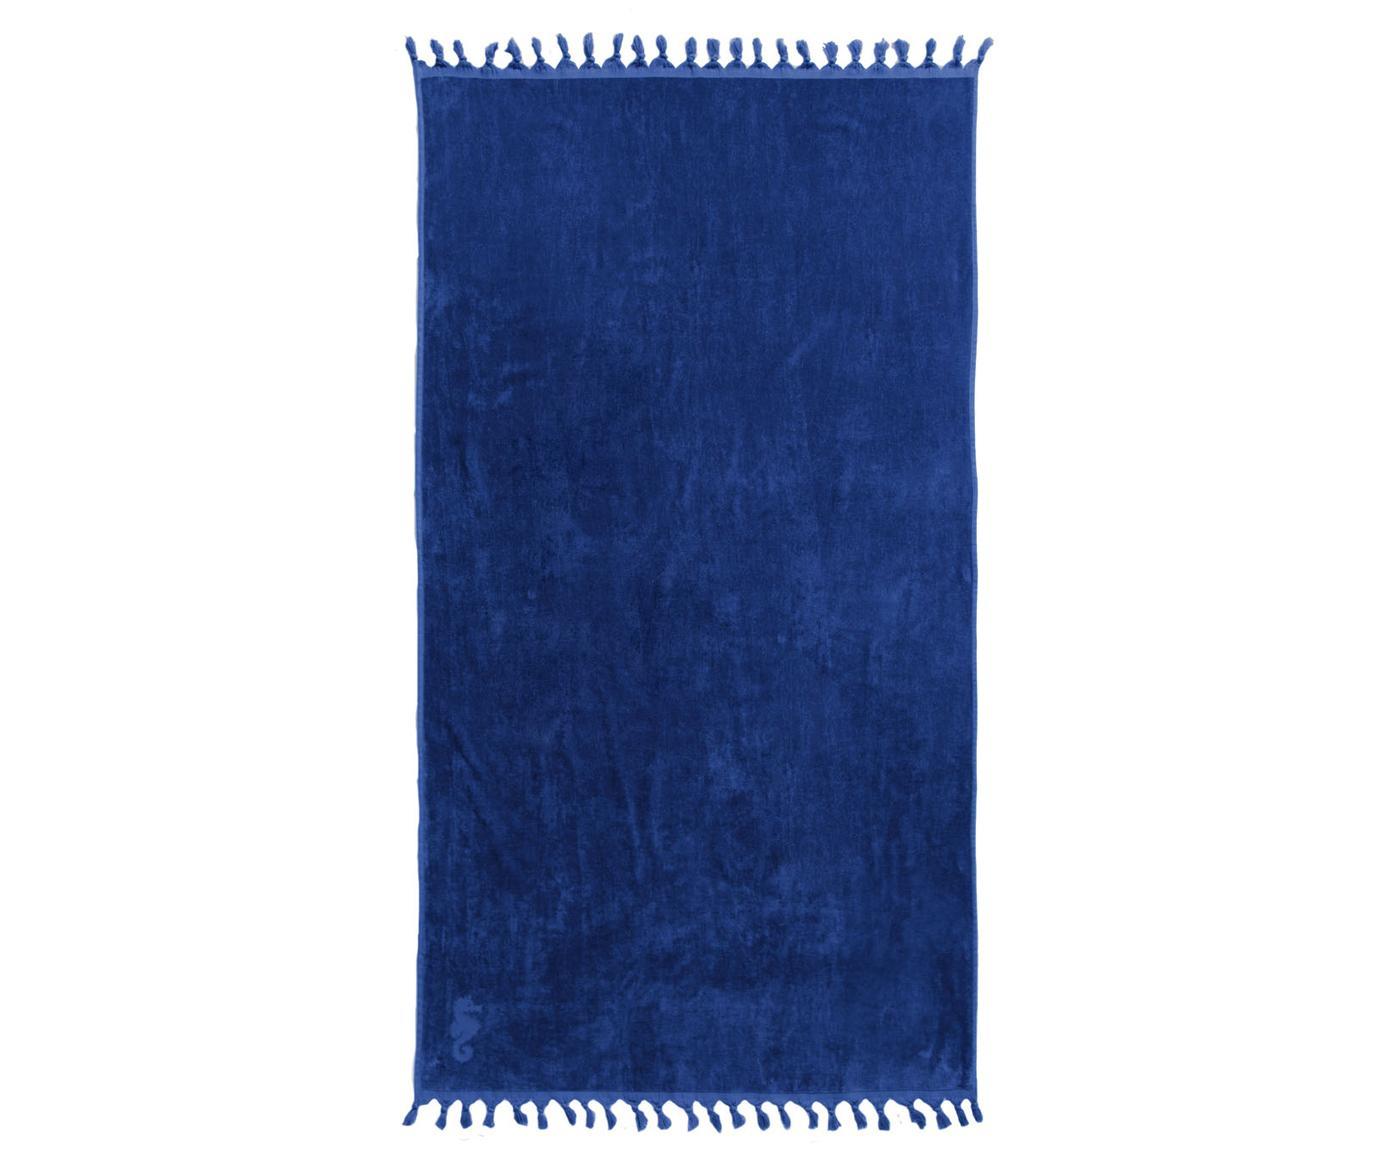 Fouta Lushie, Algodón Gramaje medio, 355g/m², Azul oscuro, An 100 x L 180 cm